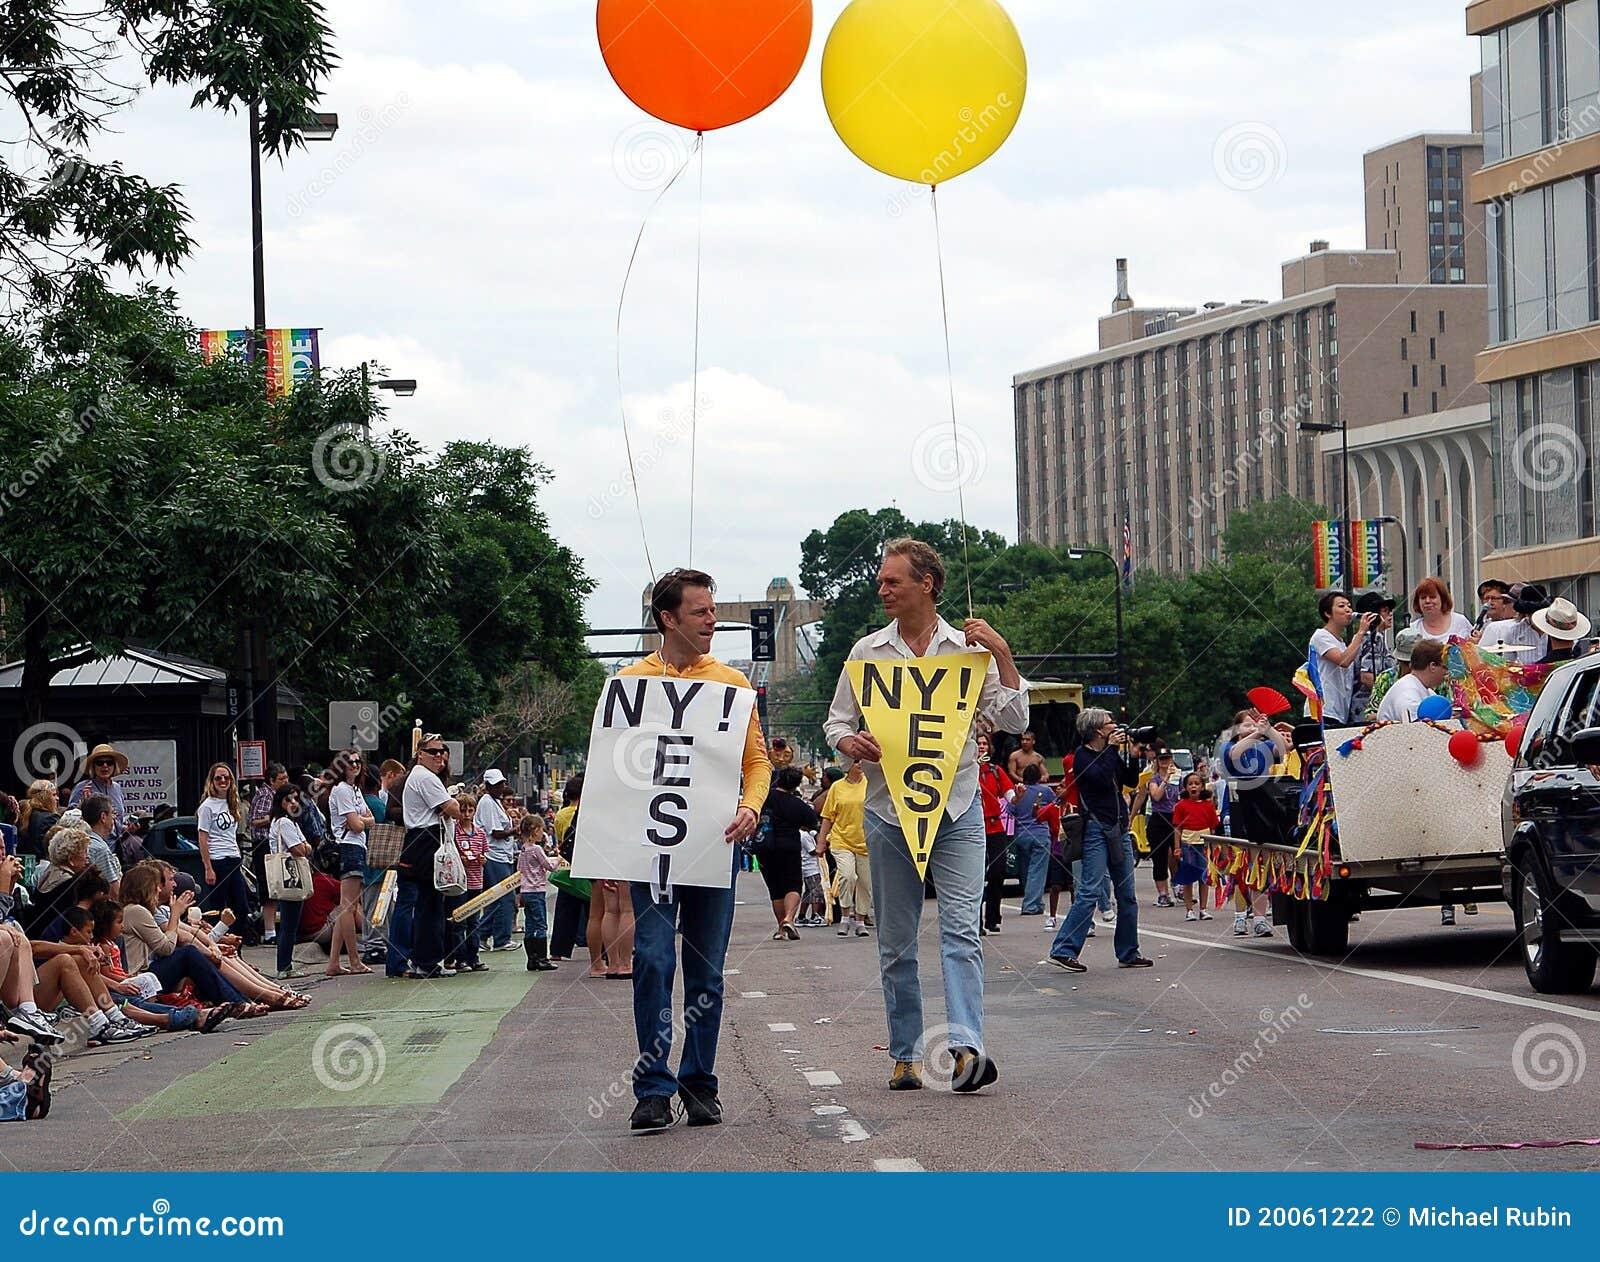 from Kasen gay pride minneapolis minnesota